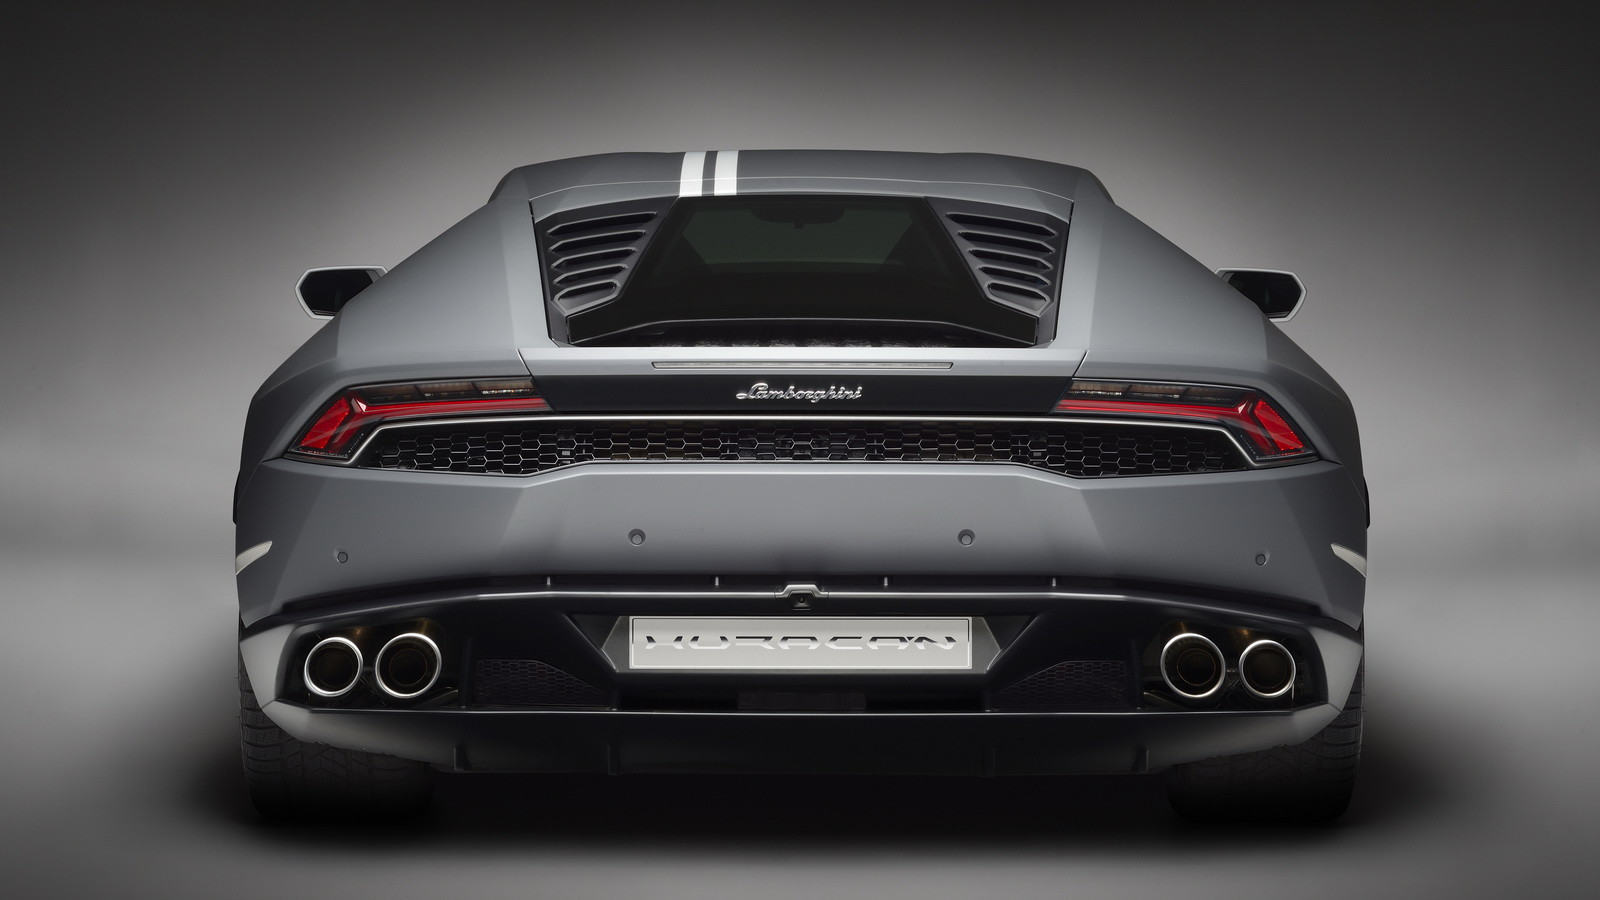 Lamborghini неисключает появление компактного спорткара